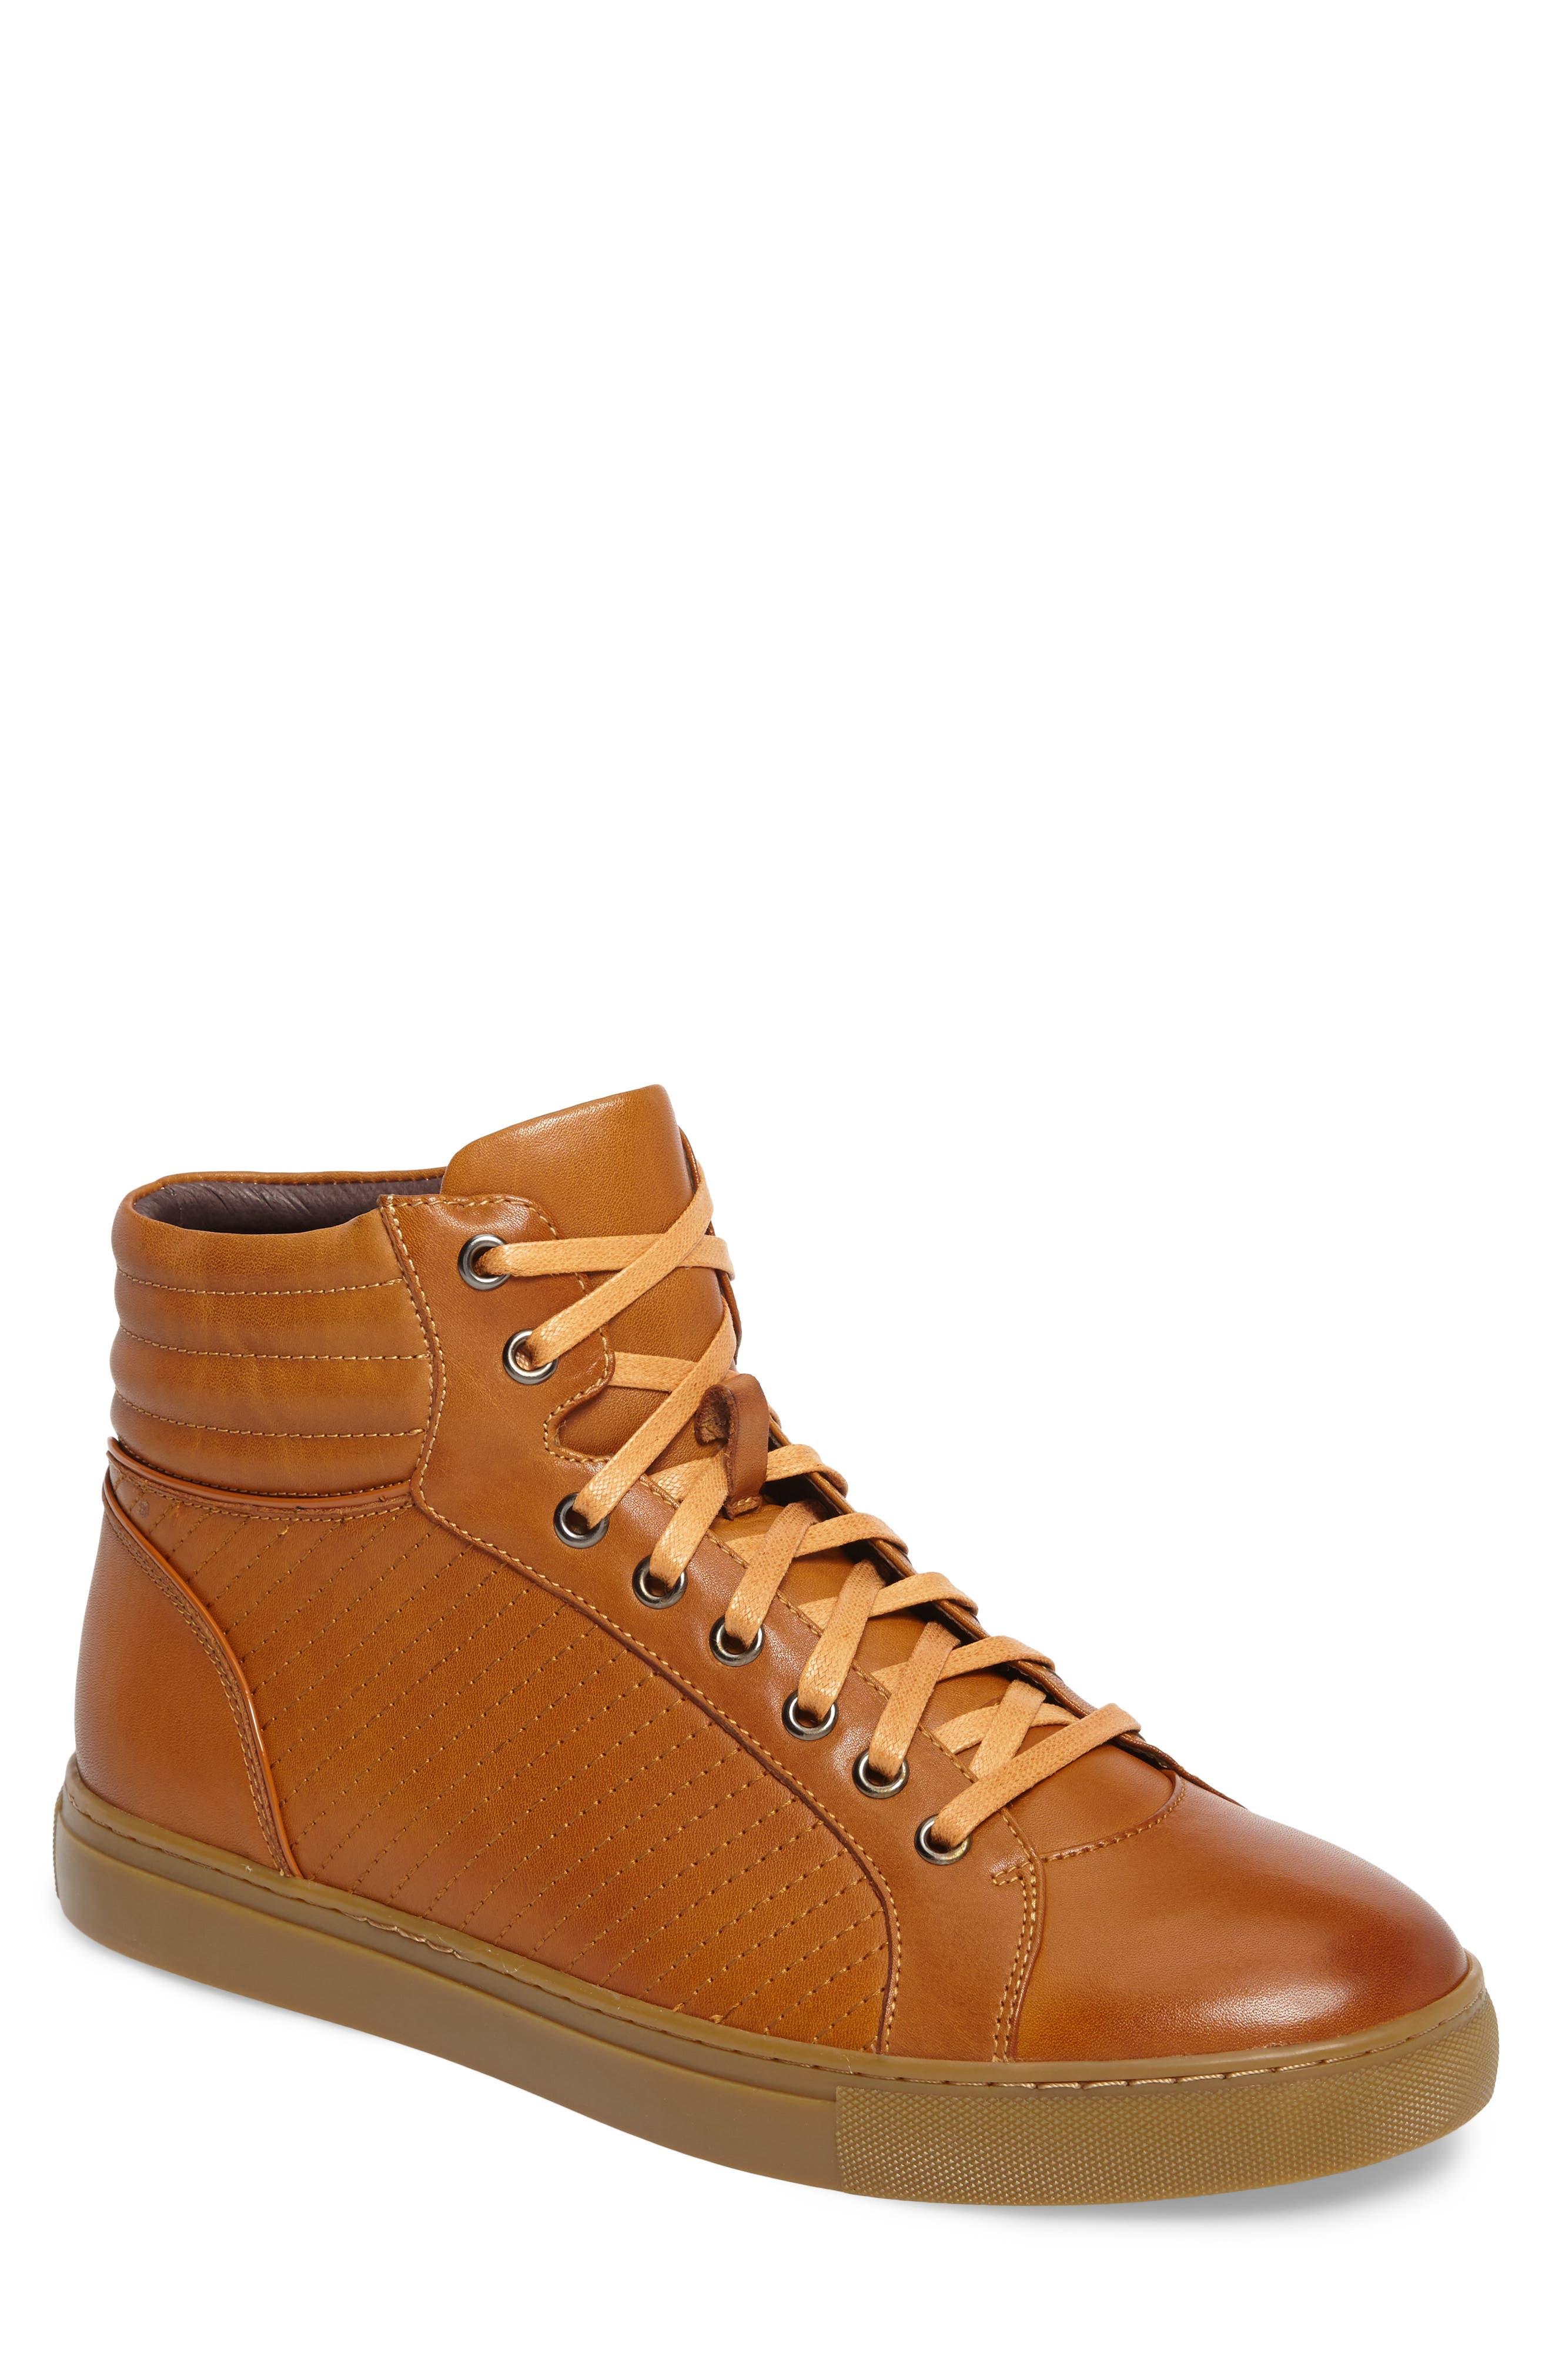 Youse Sneaker,                             Main thumbnail 1, color,                             Cognac Leather